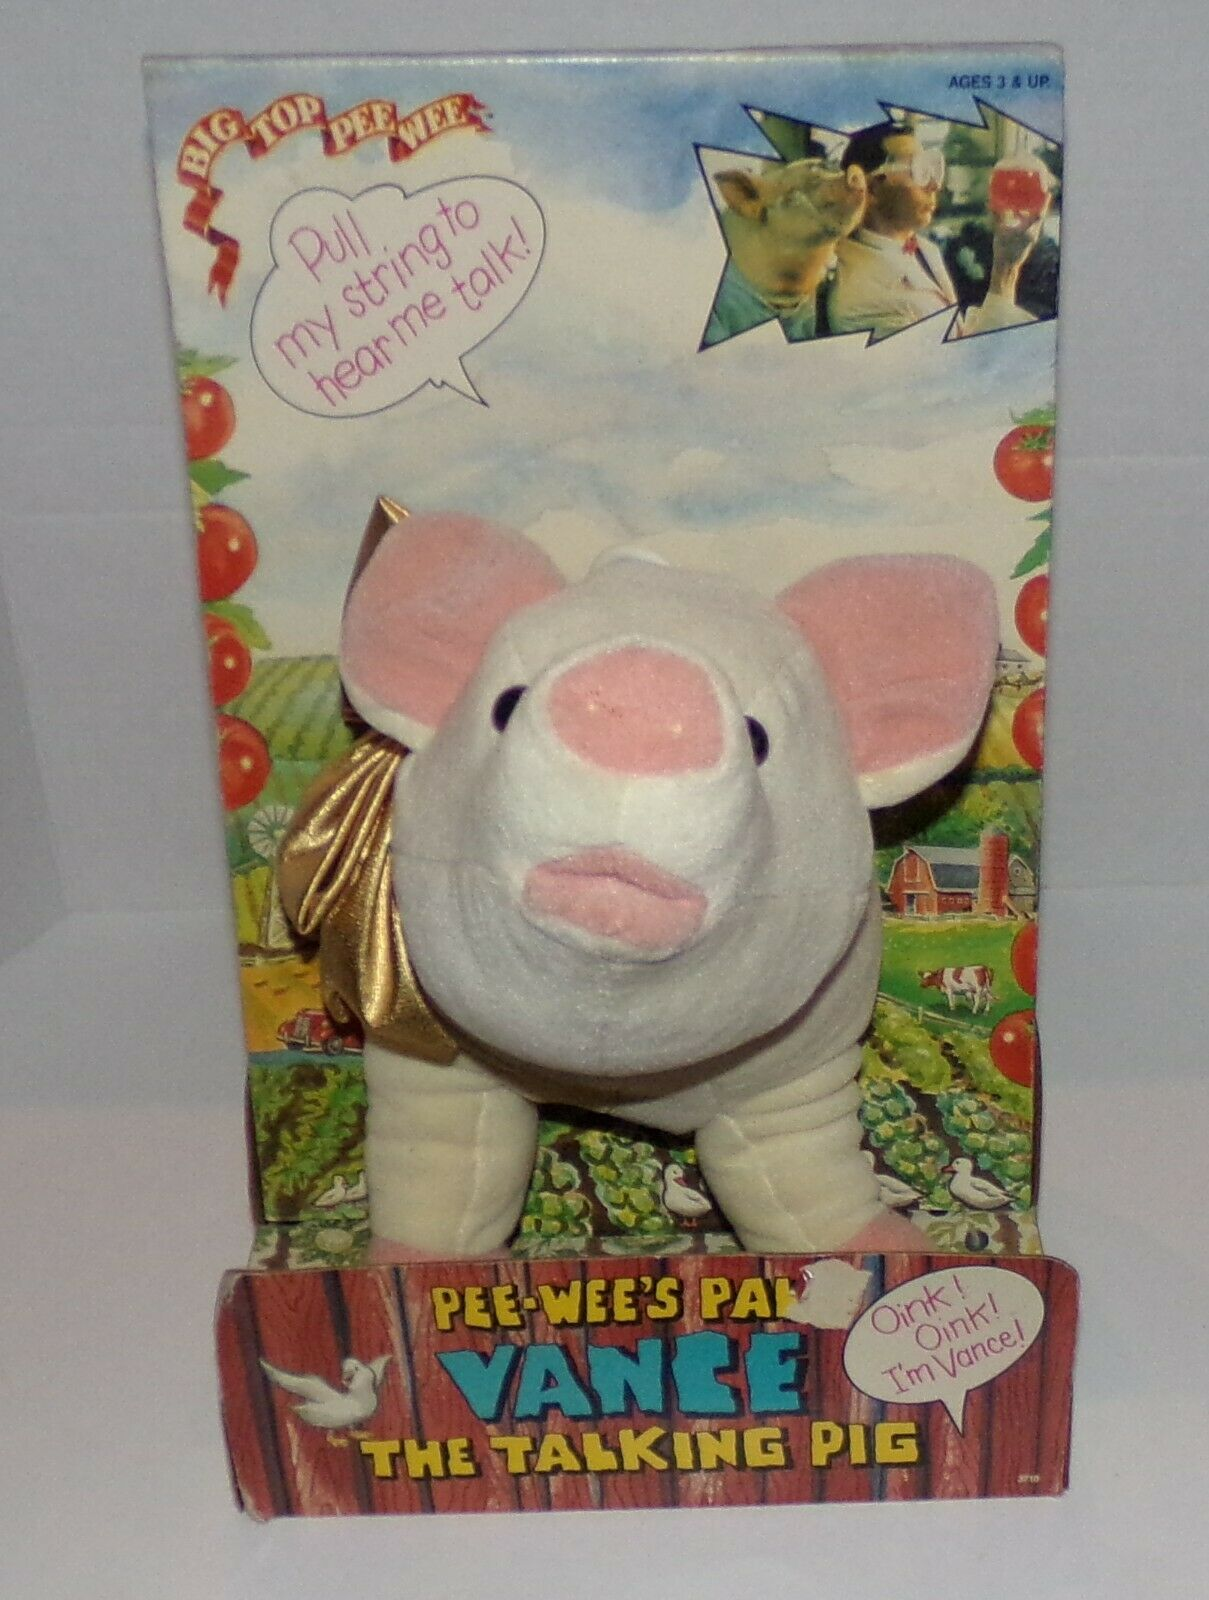 Pee-Wee's Pal Vance The Talking Pig Pull String Plush Toy 1988 Matchbox NIB